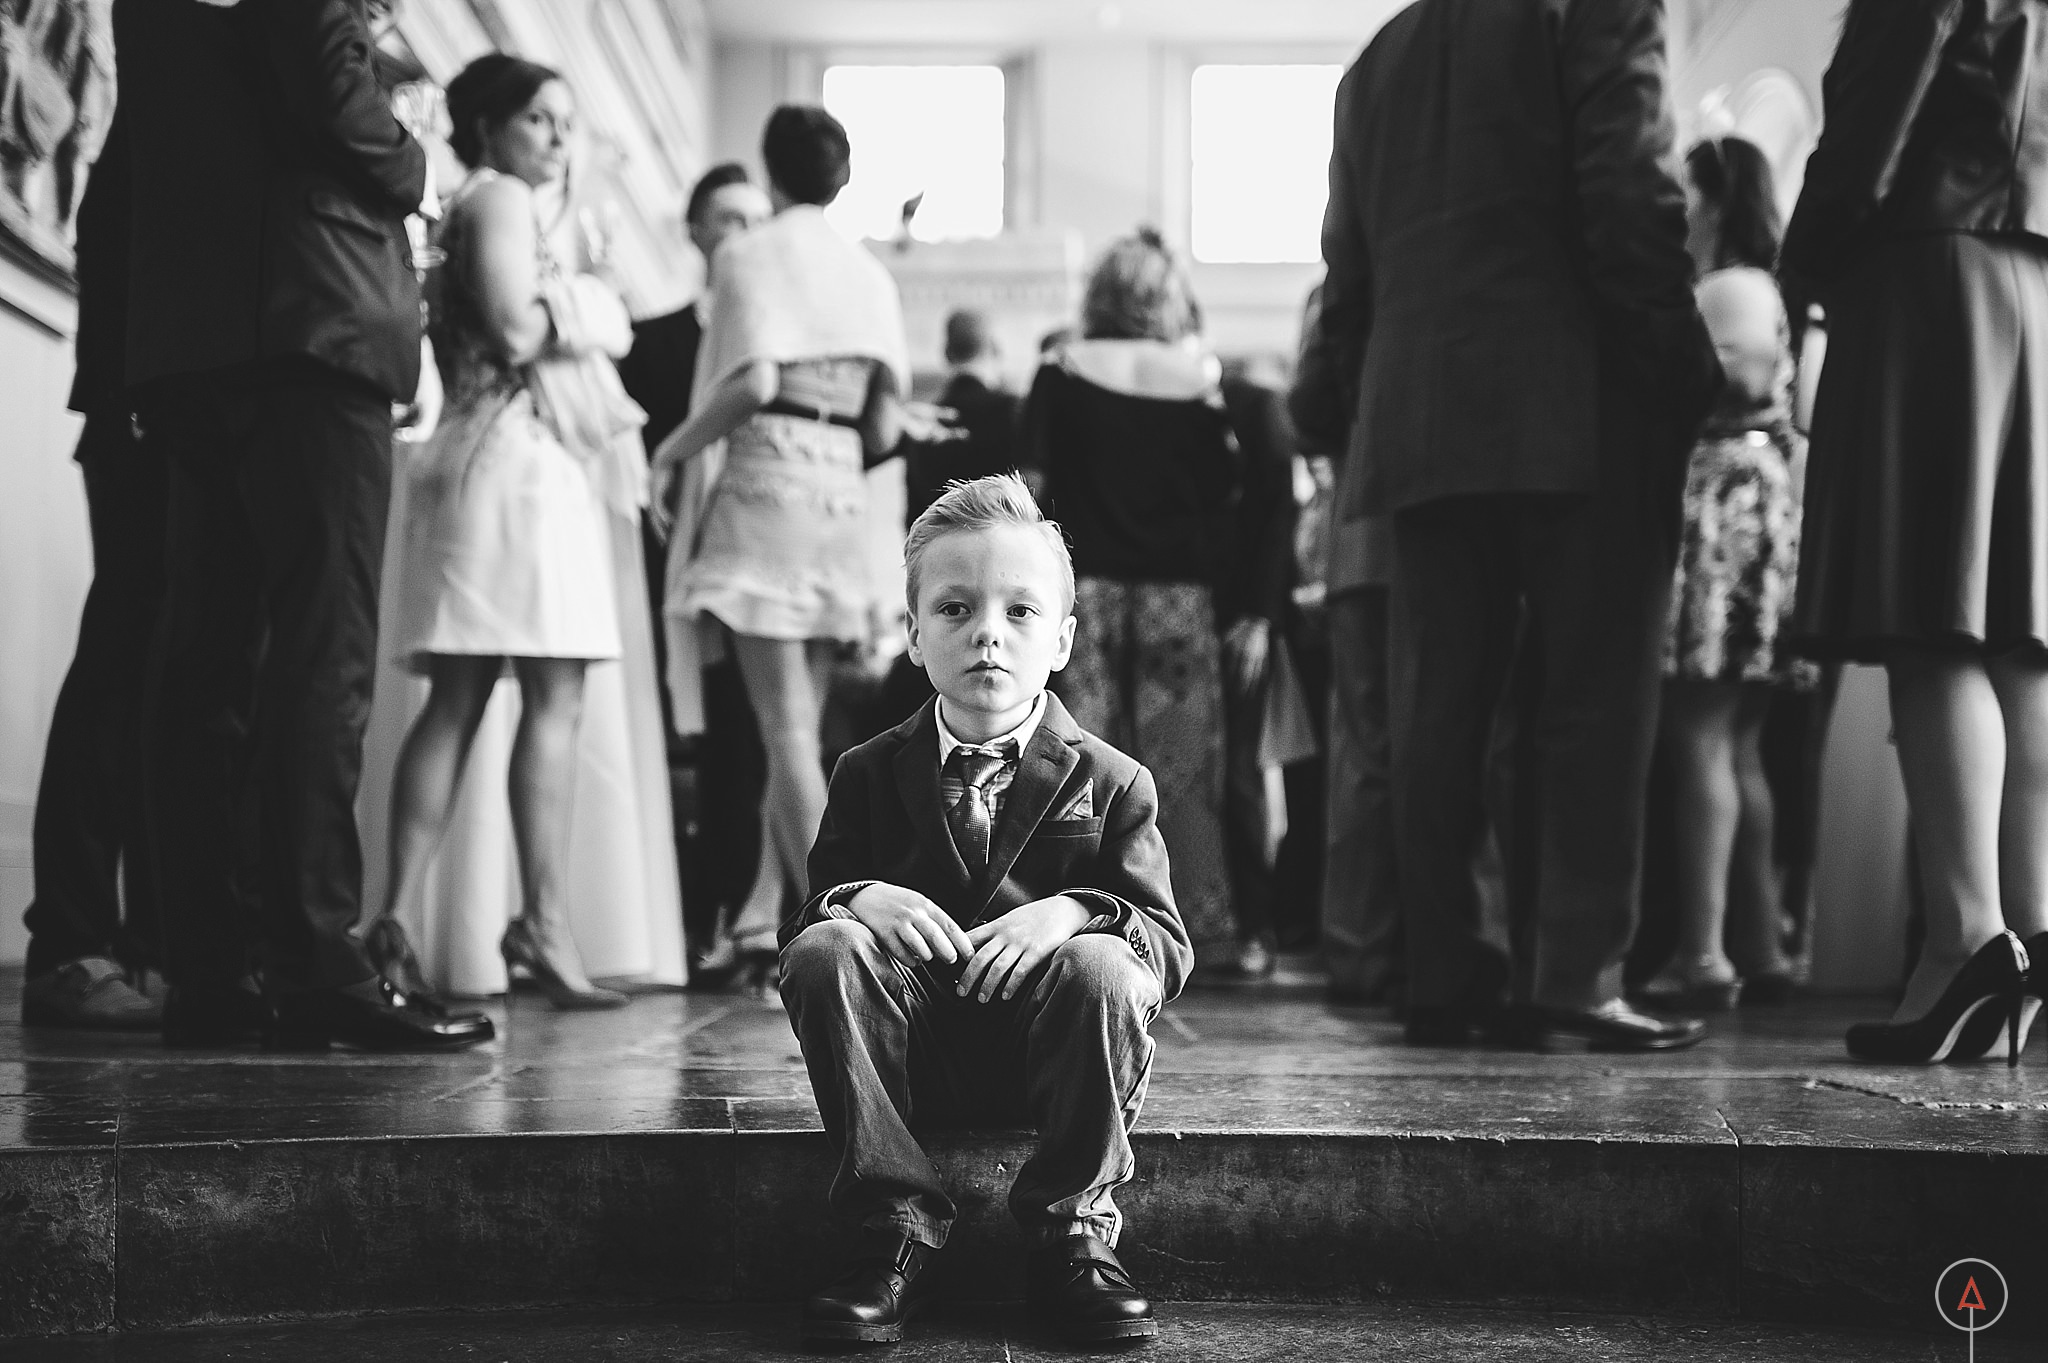 cardiff-wedding-photographer-aga-tomaszek_0272